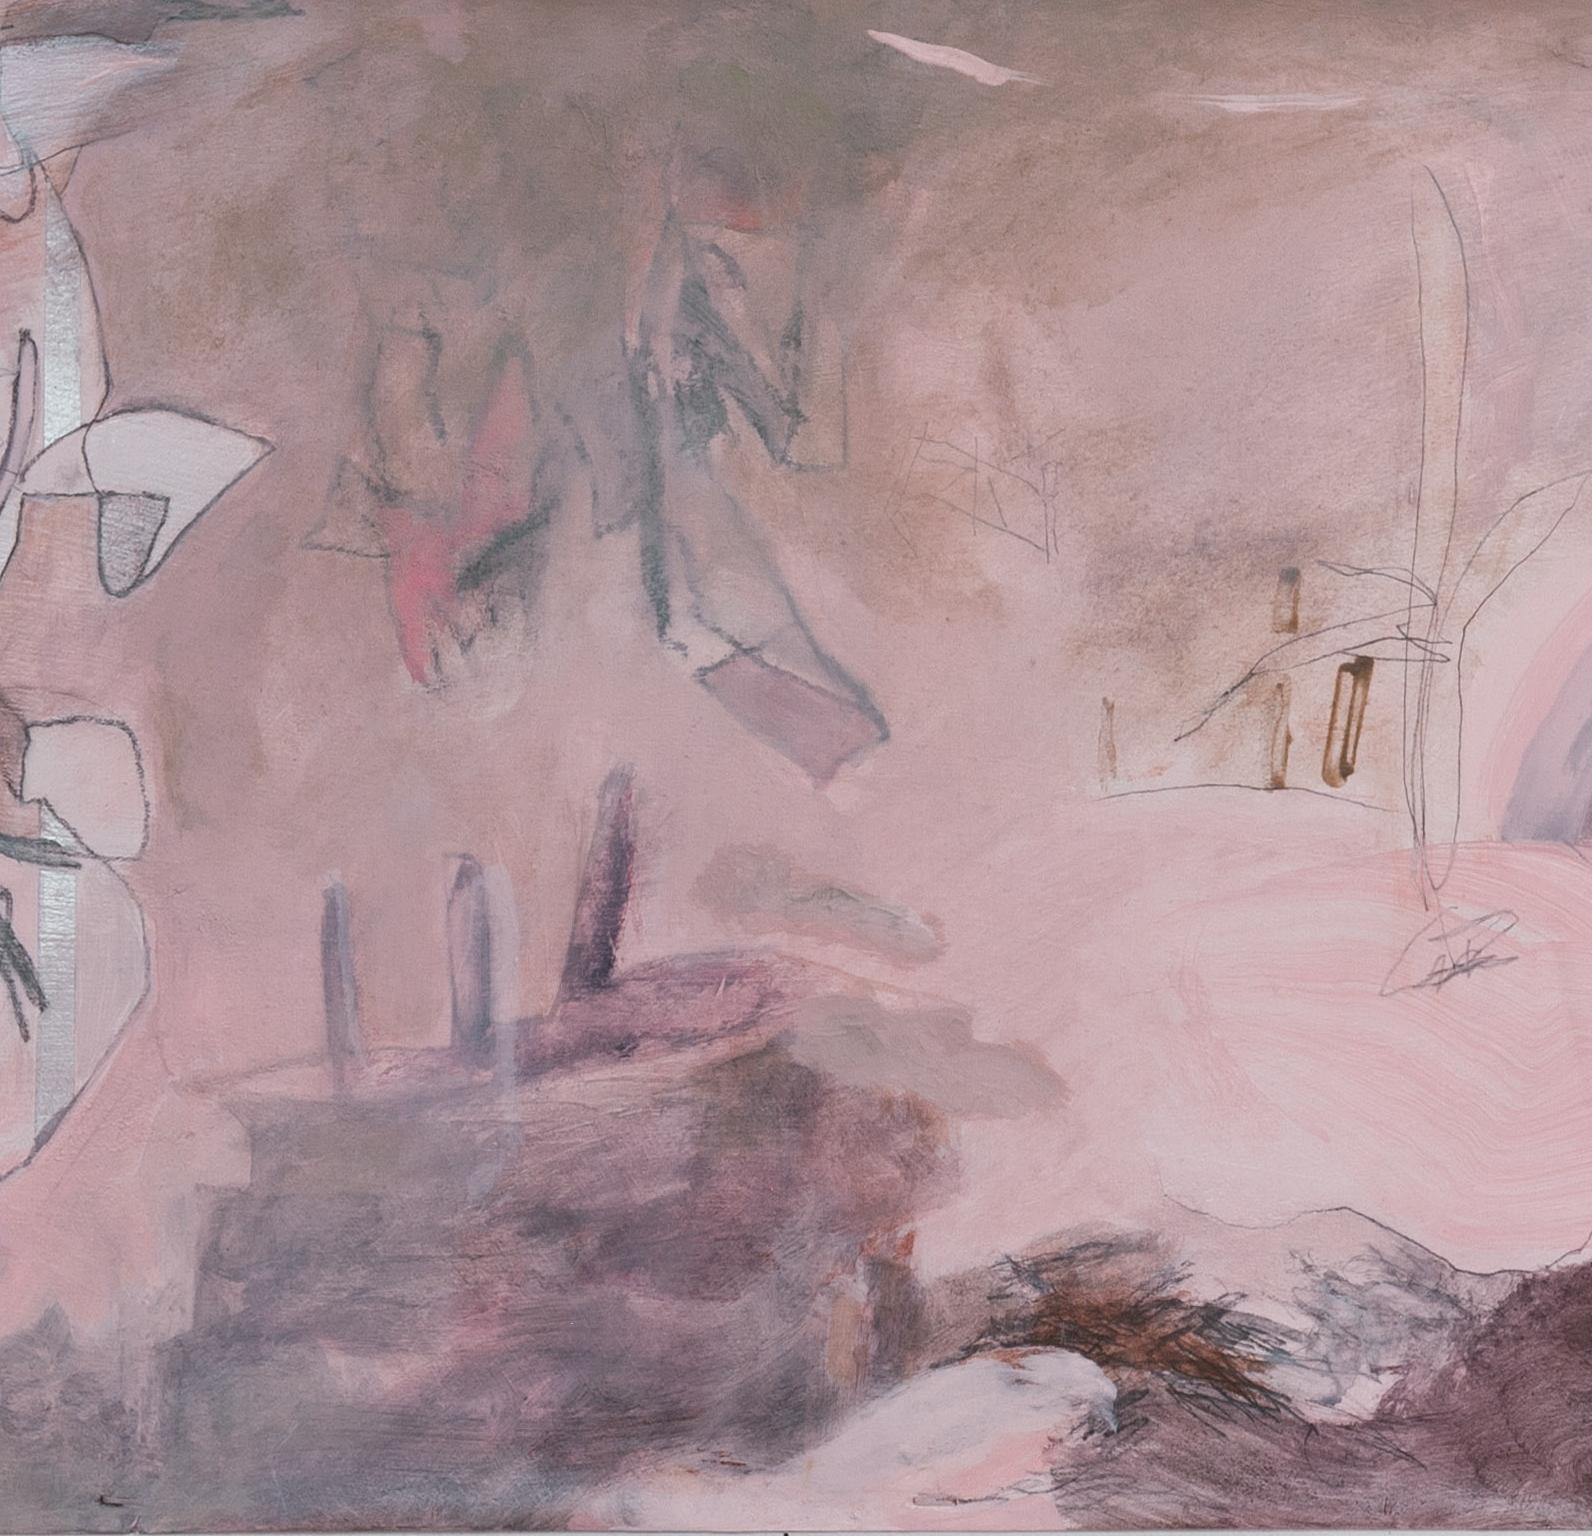 Departure(Pink Painting), detail